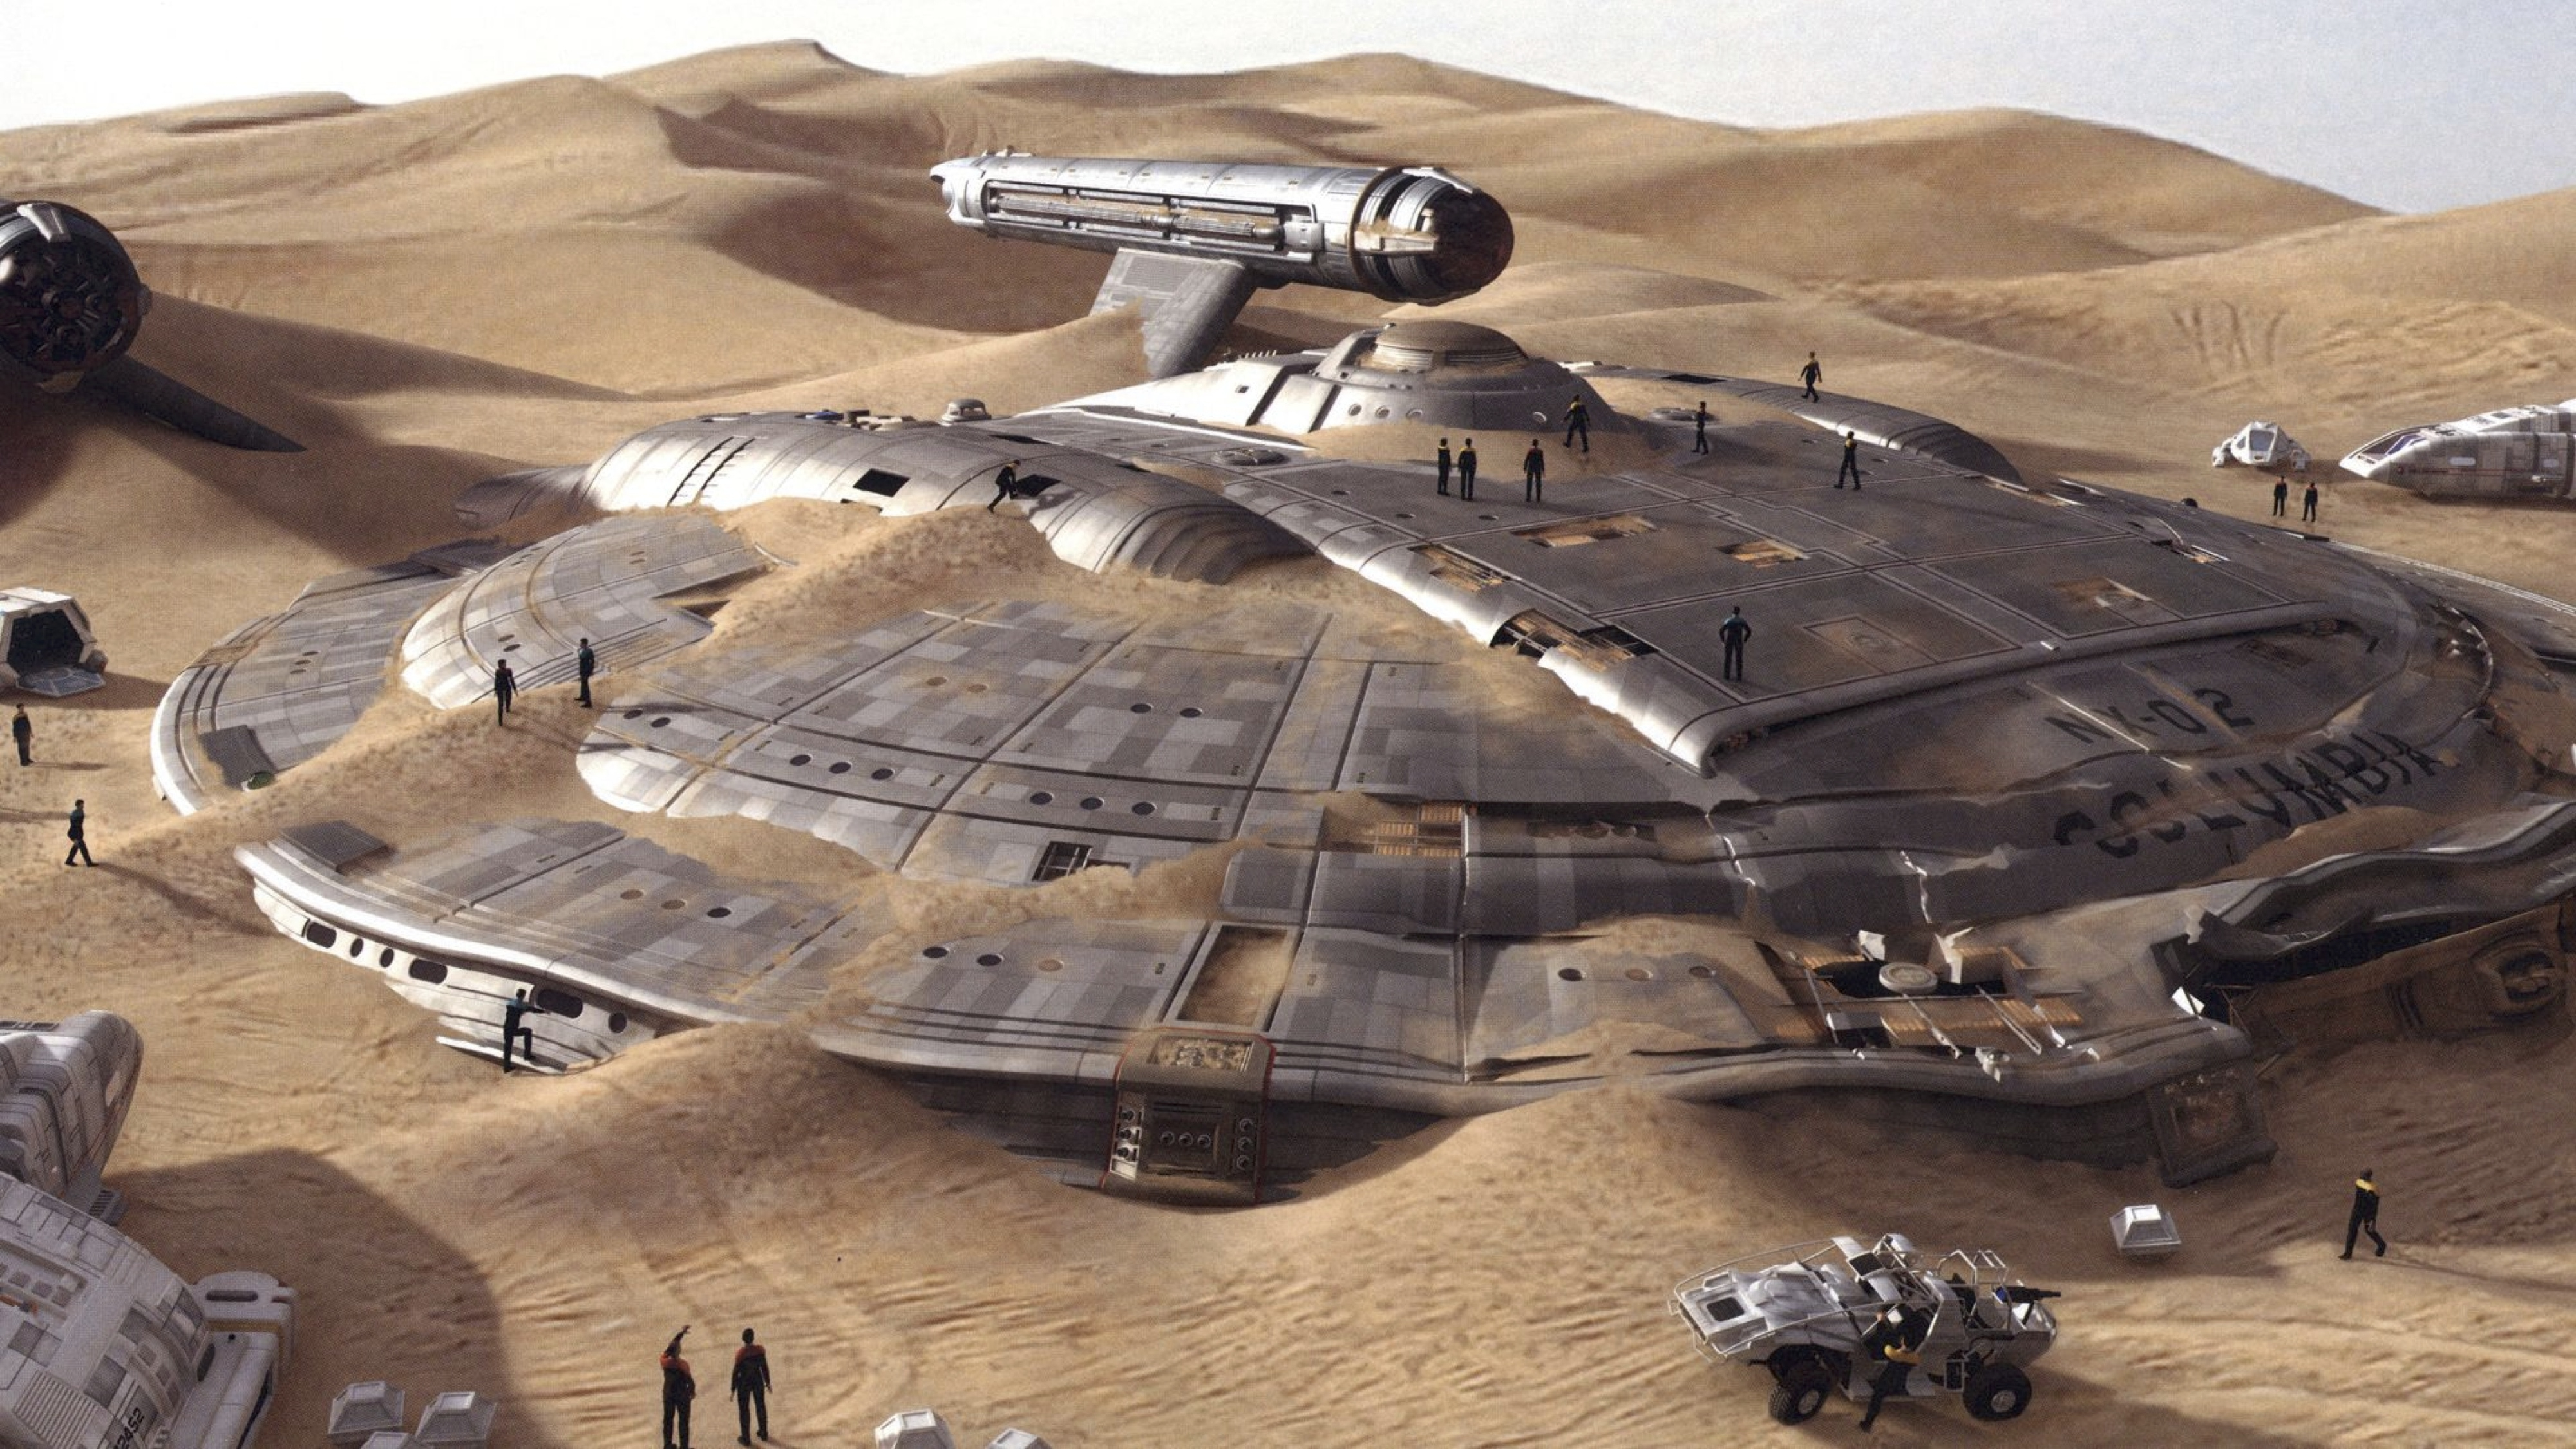 Star Trek Ship Wallpapers: Star Trek: Ships Of The Line 4k Ultra HD Wallpaper